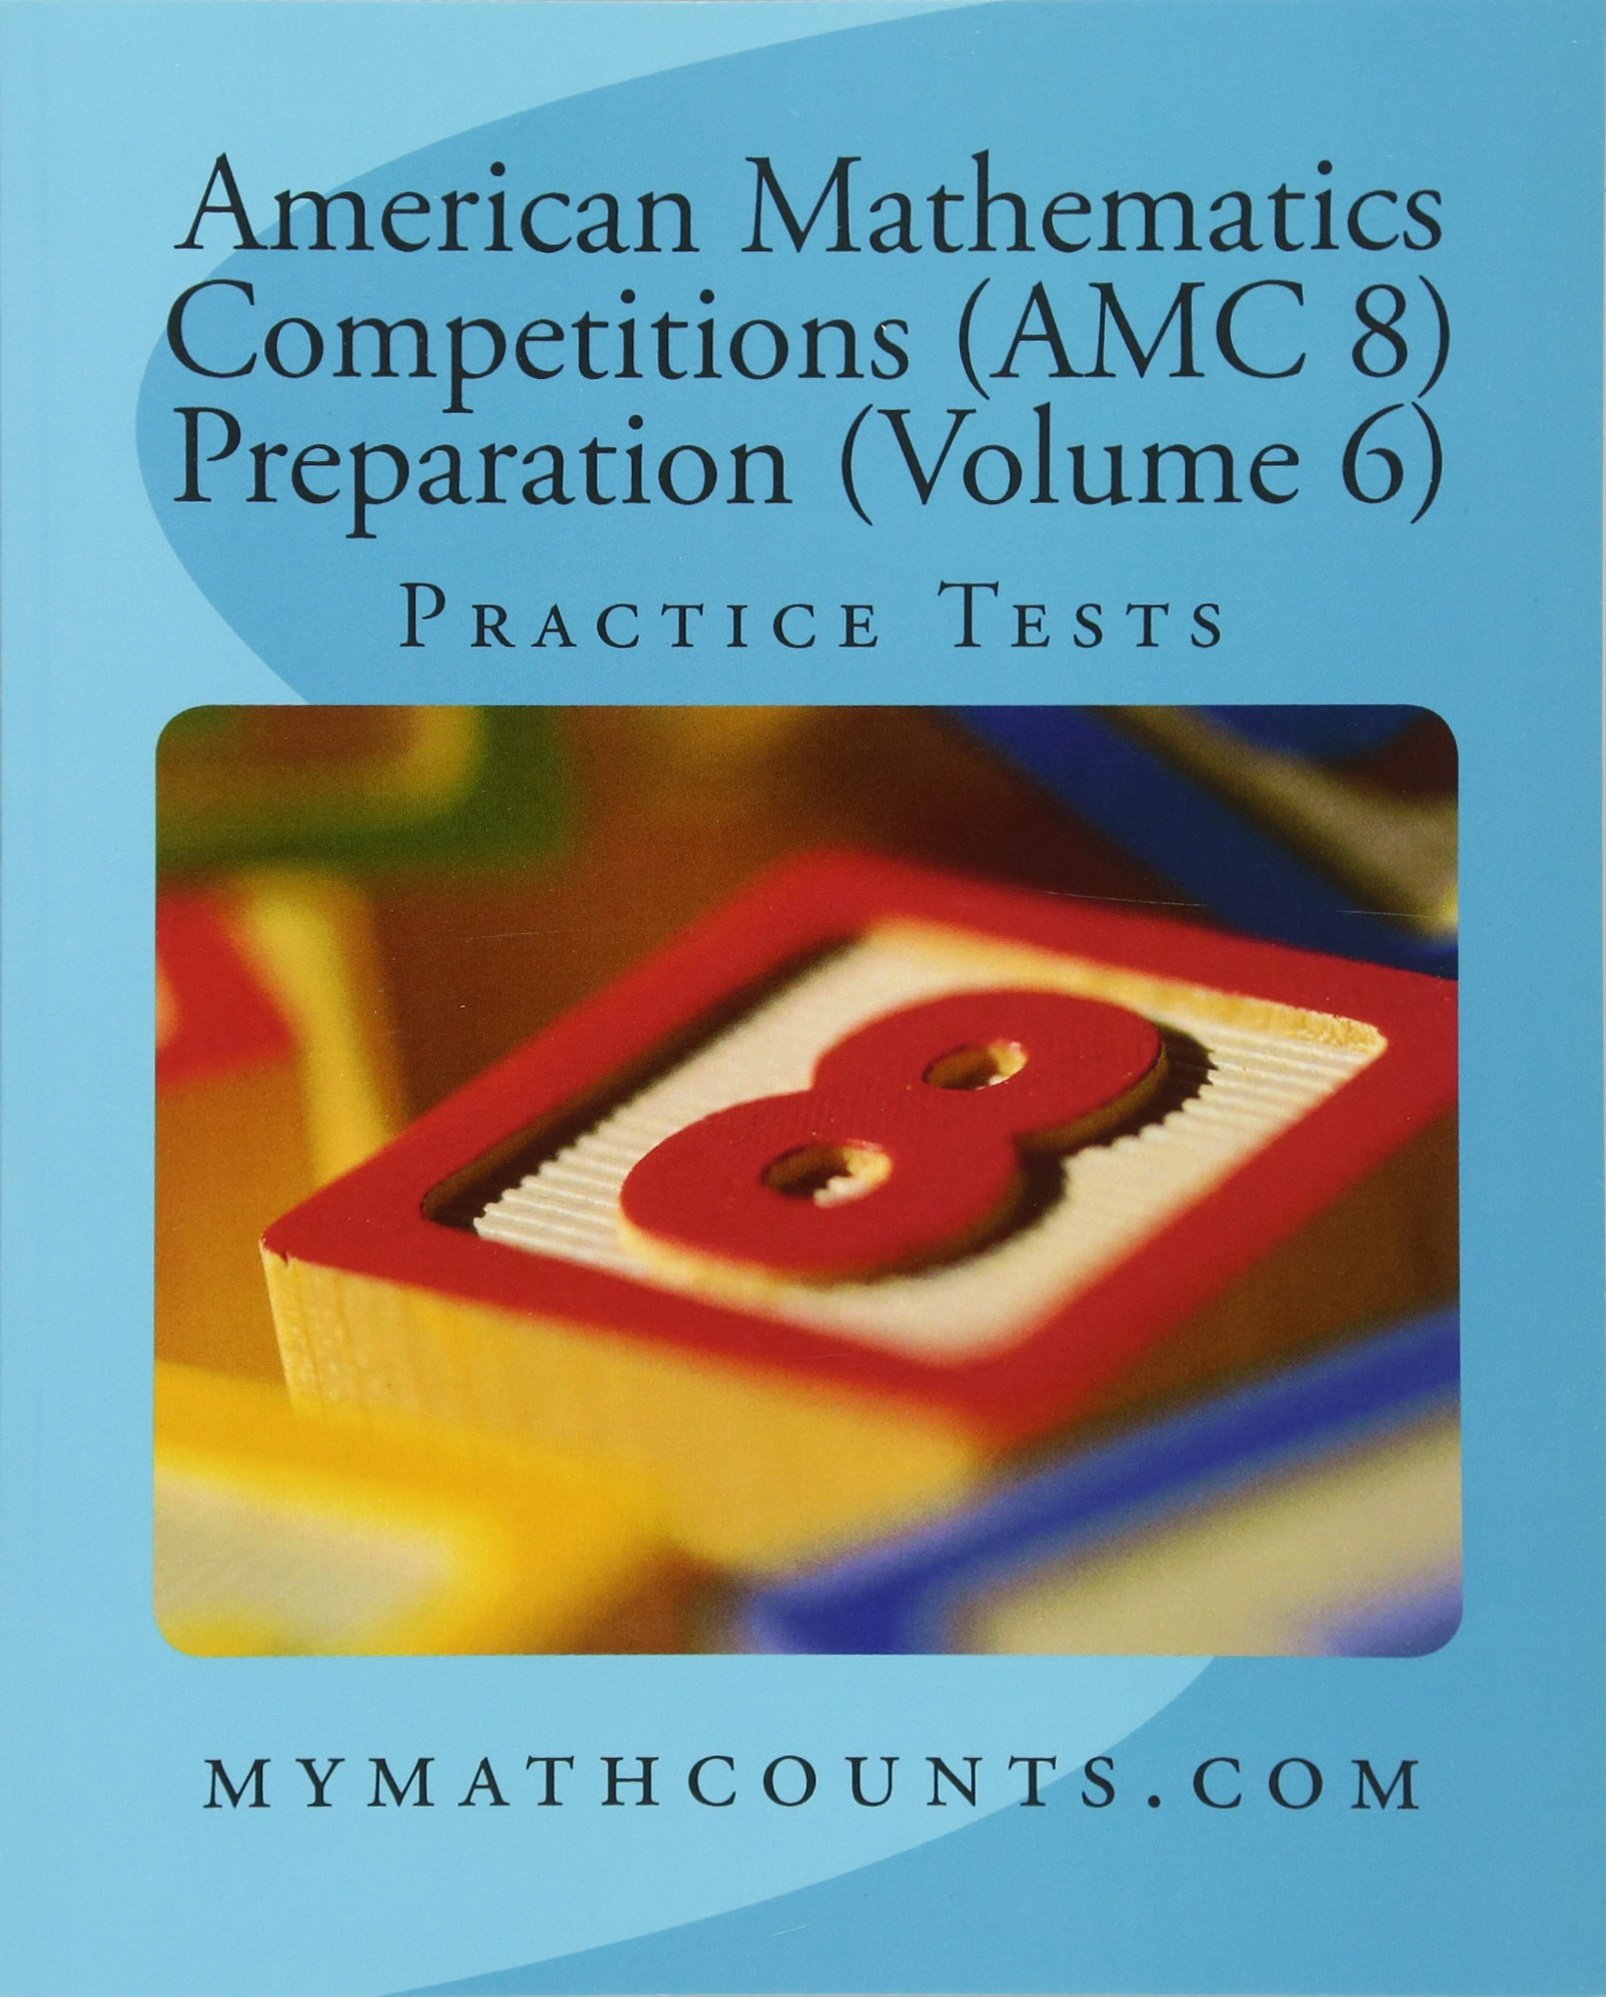 Amazon.com: American Mathematics Competitions (AMC 8) Preparation ...